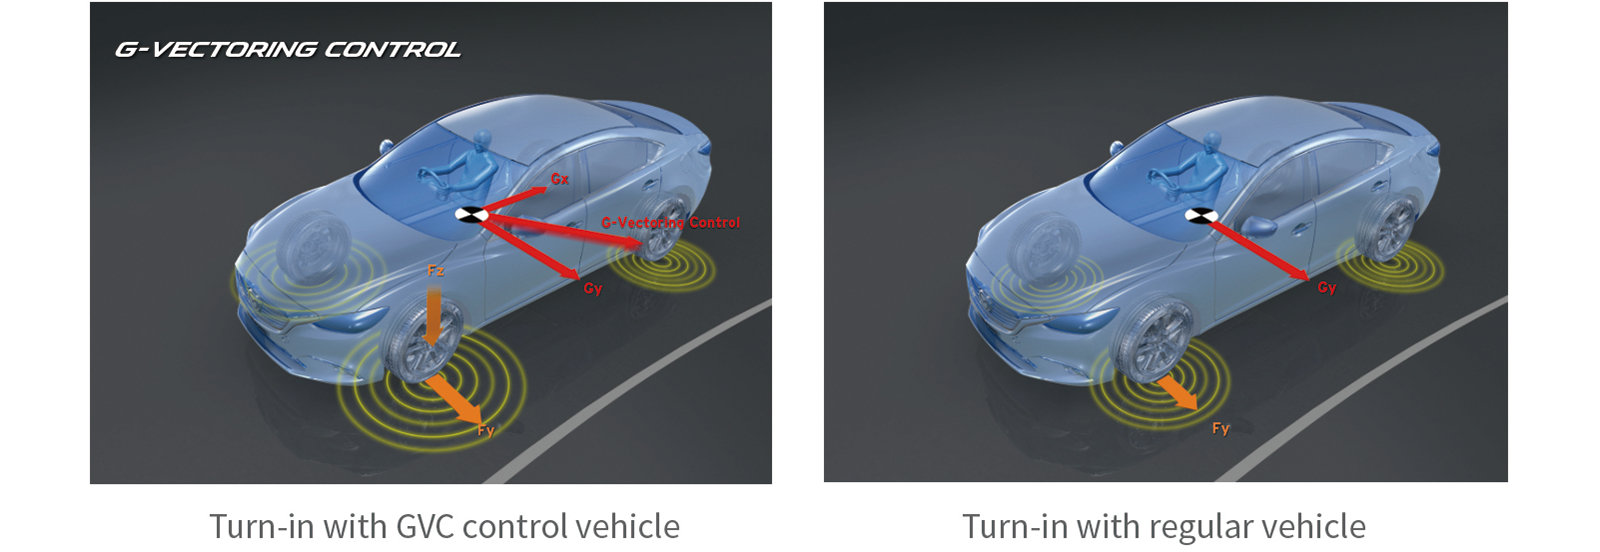 Así funciona el G-Vectoring Control de Mazda